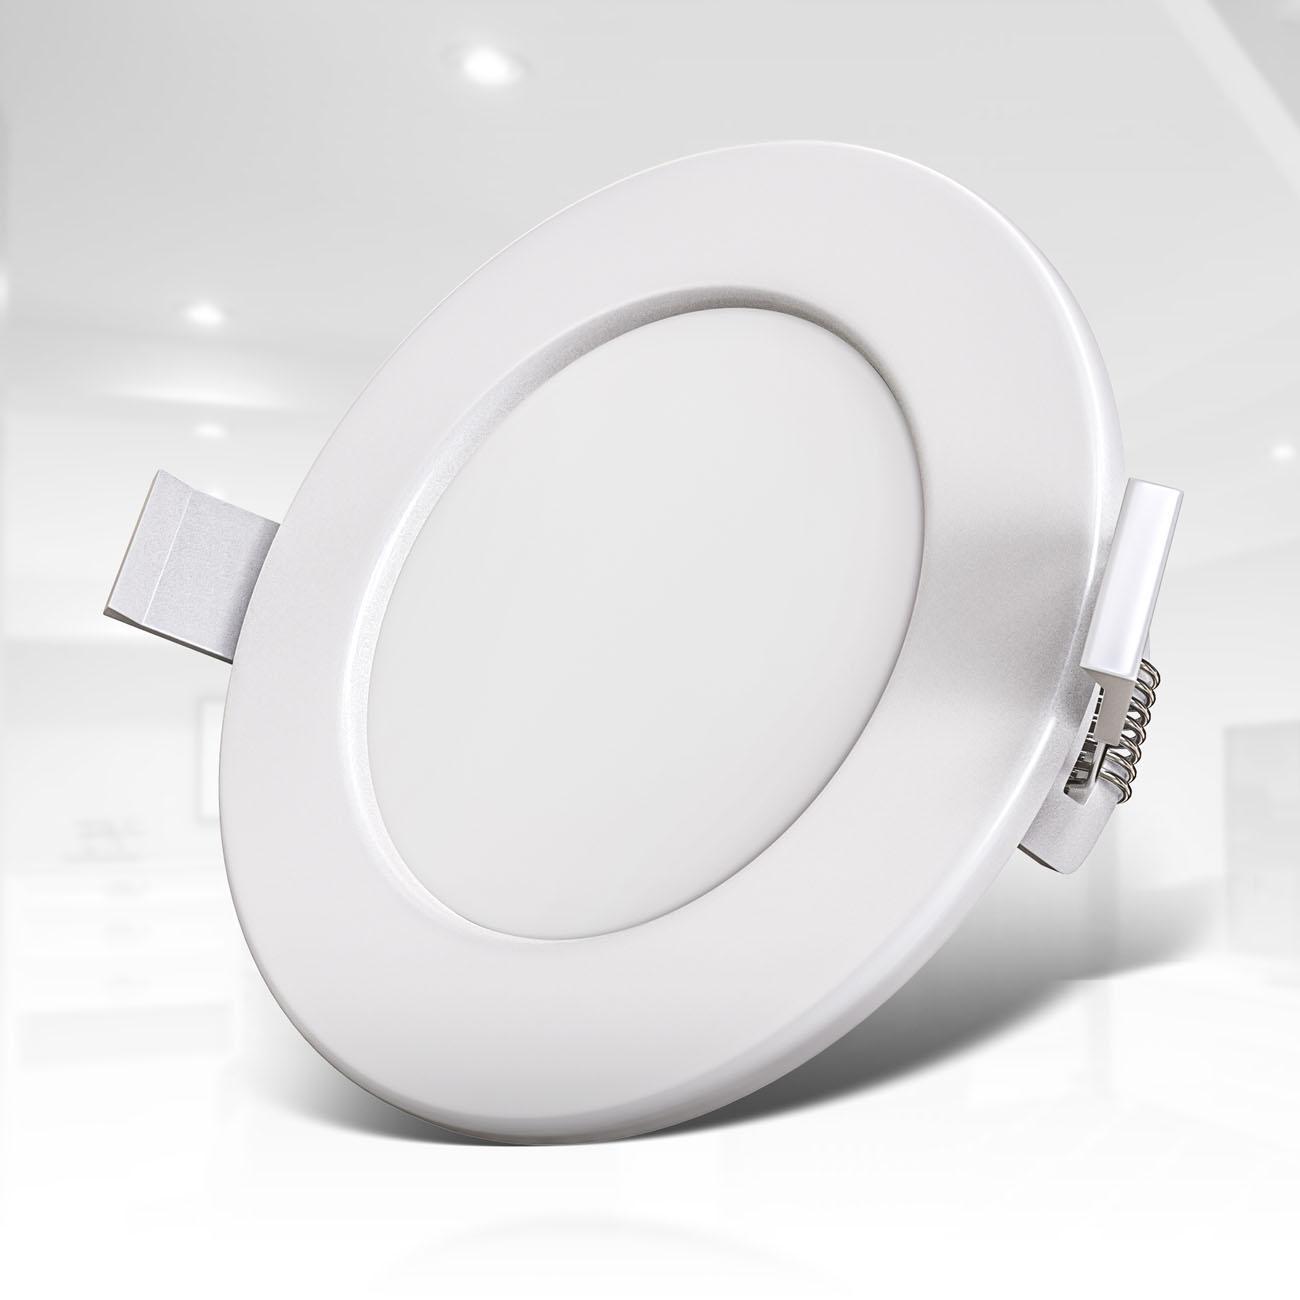 LED Einbaustrahler | Bad Einbauleuchte 6er SET | ultra flach 6W IP44 dimmbar - 4